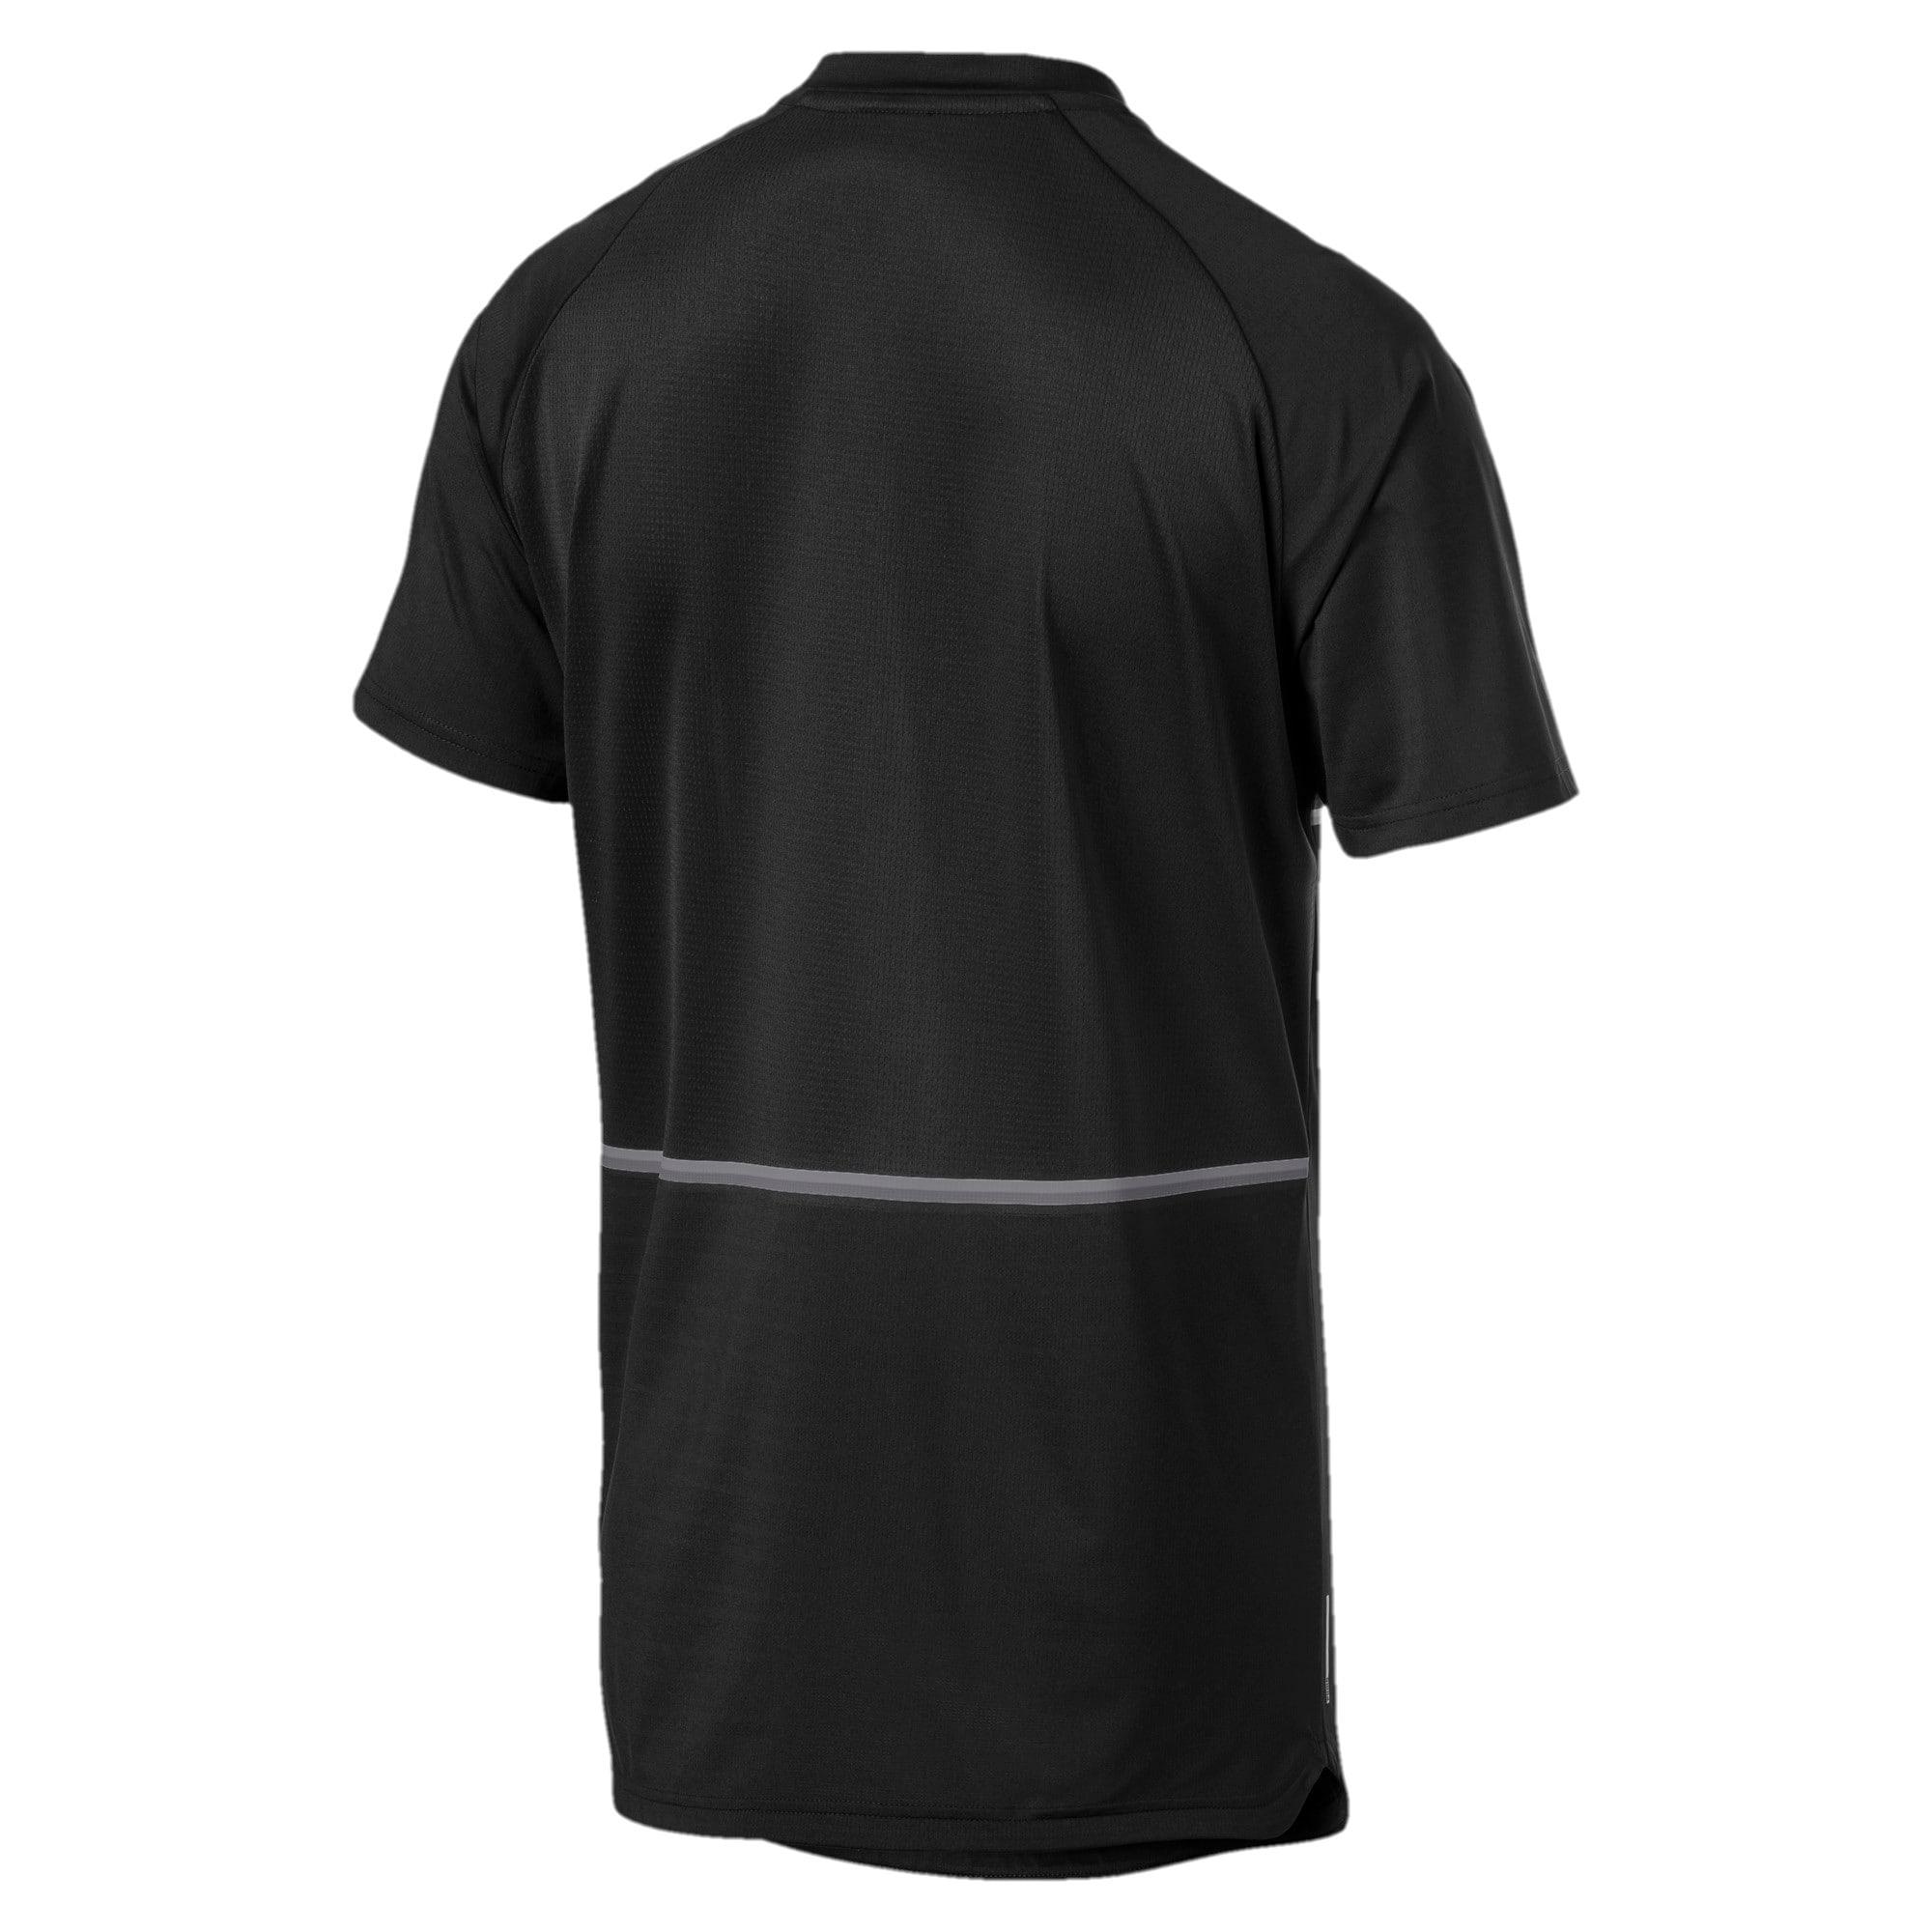 Thumbnail 5 of Power BND T-shirt voor heren, Puma Black, medium